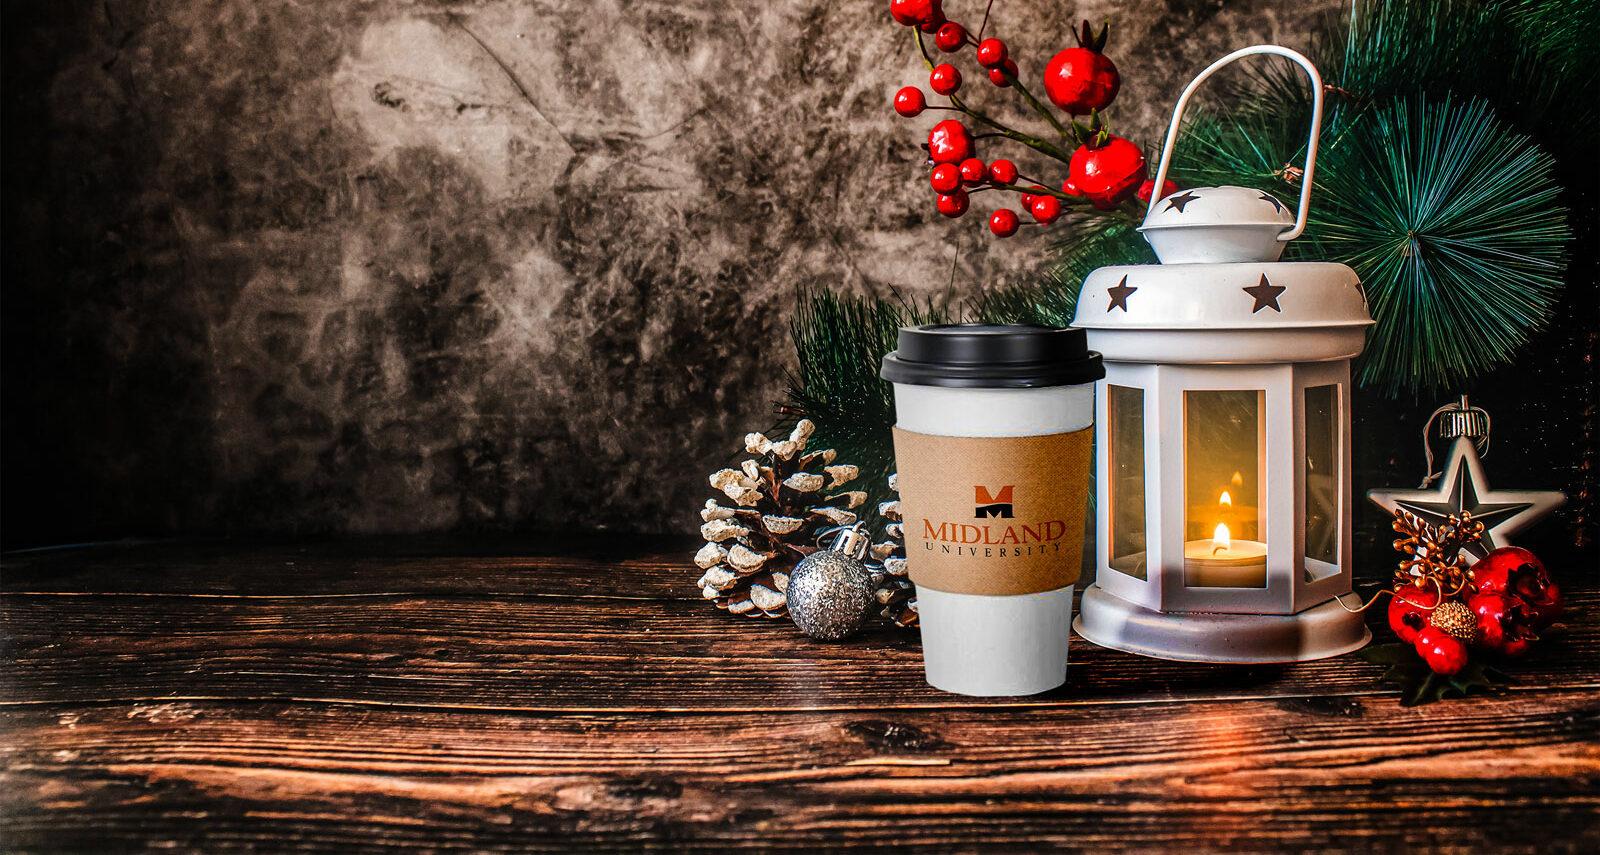 Midland University Holiday Coffee